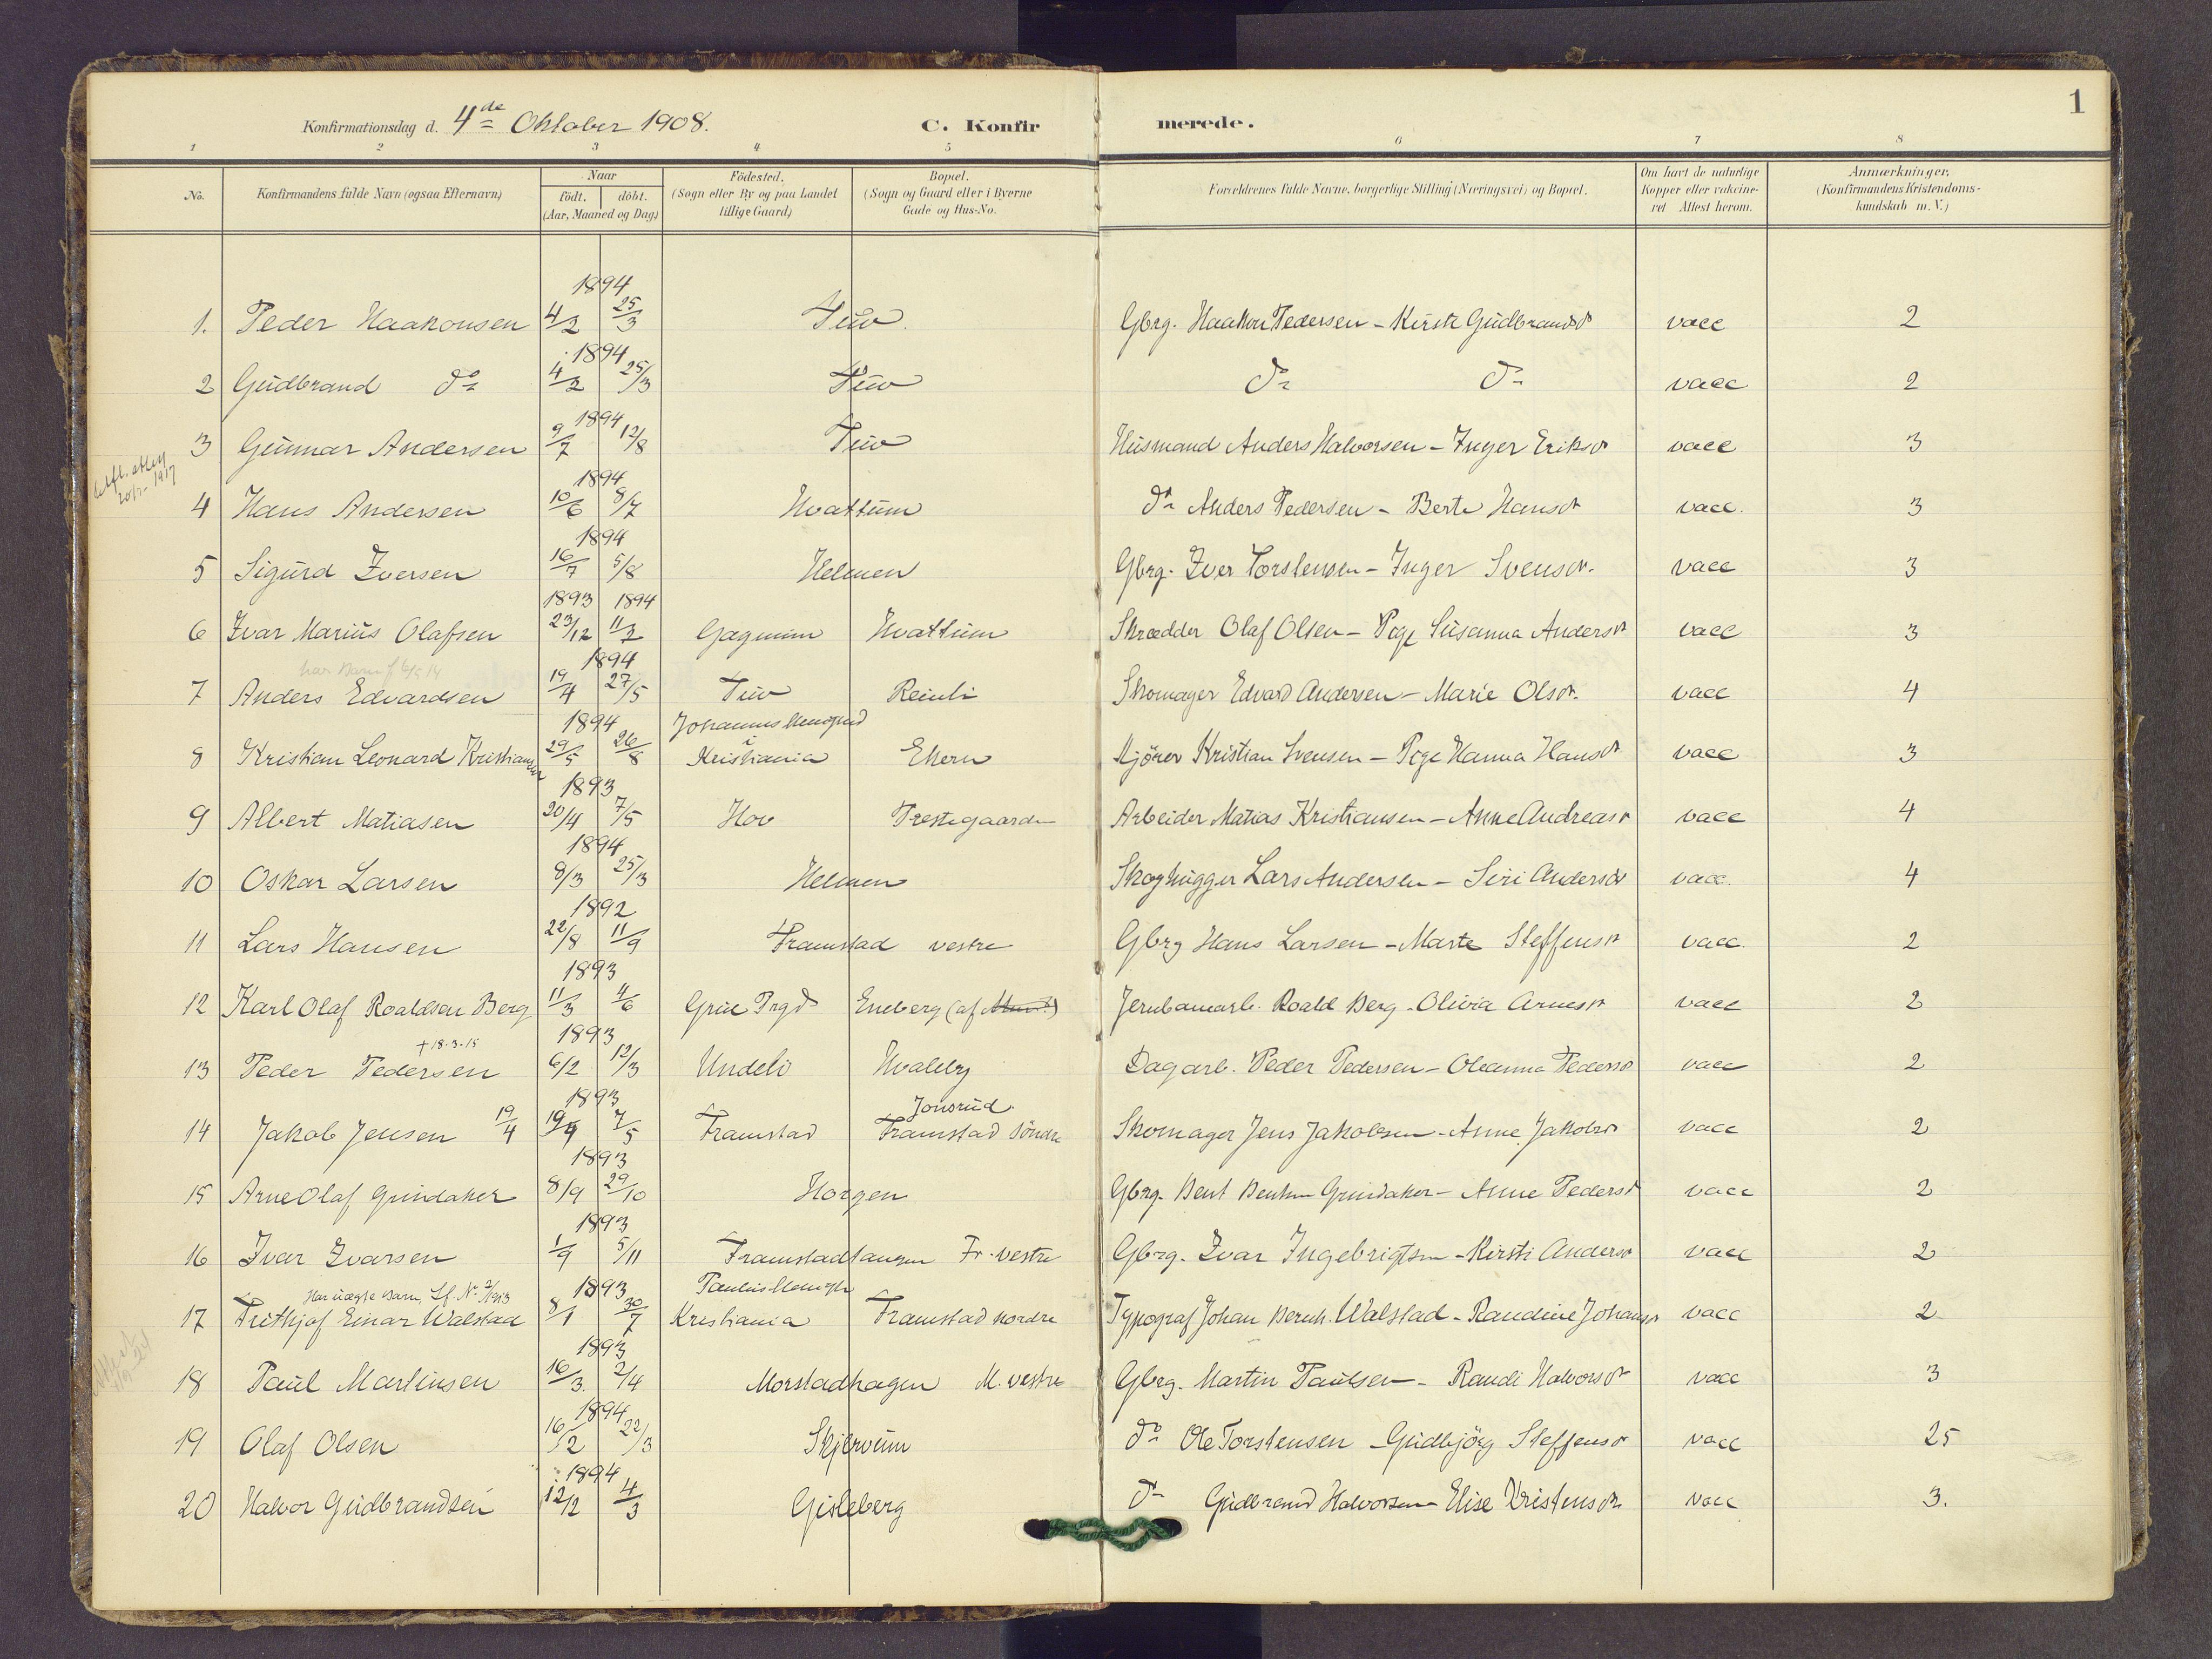 SAH, Gran prestekontor, Ministerialbok nr. 22, 1908-1918, s. 1